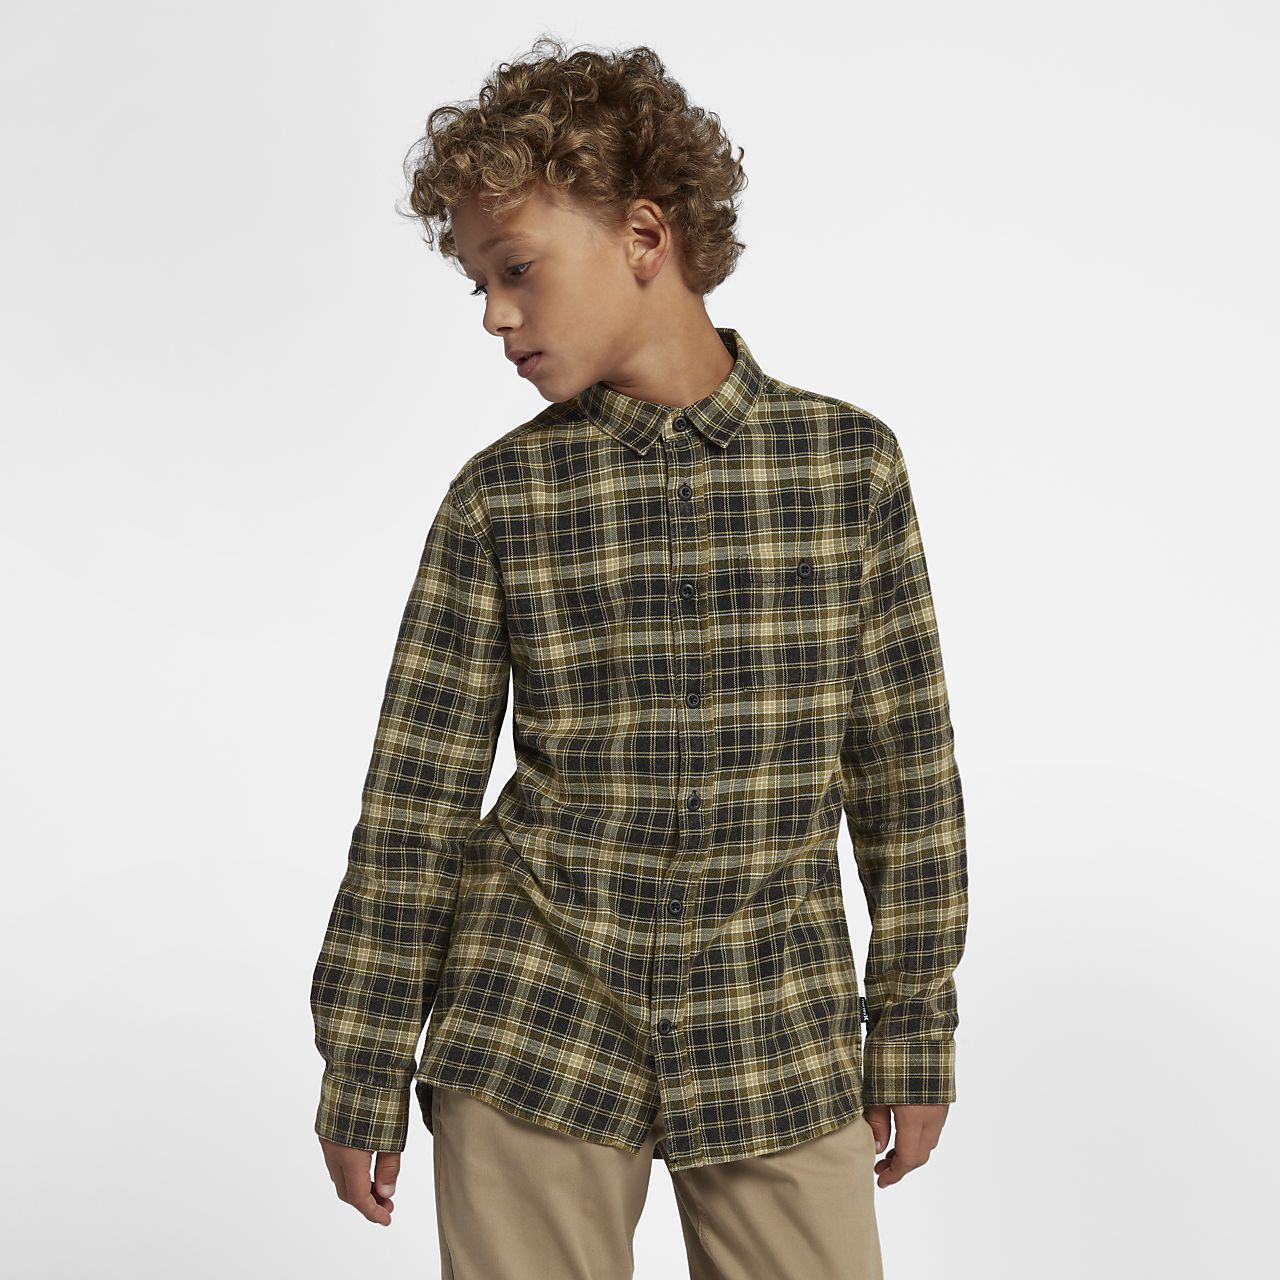 Prenda superior de manga larga tejida para niño Hurley Ranger